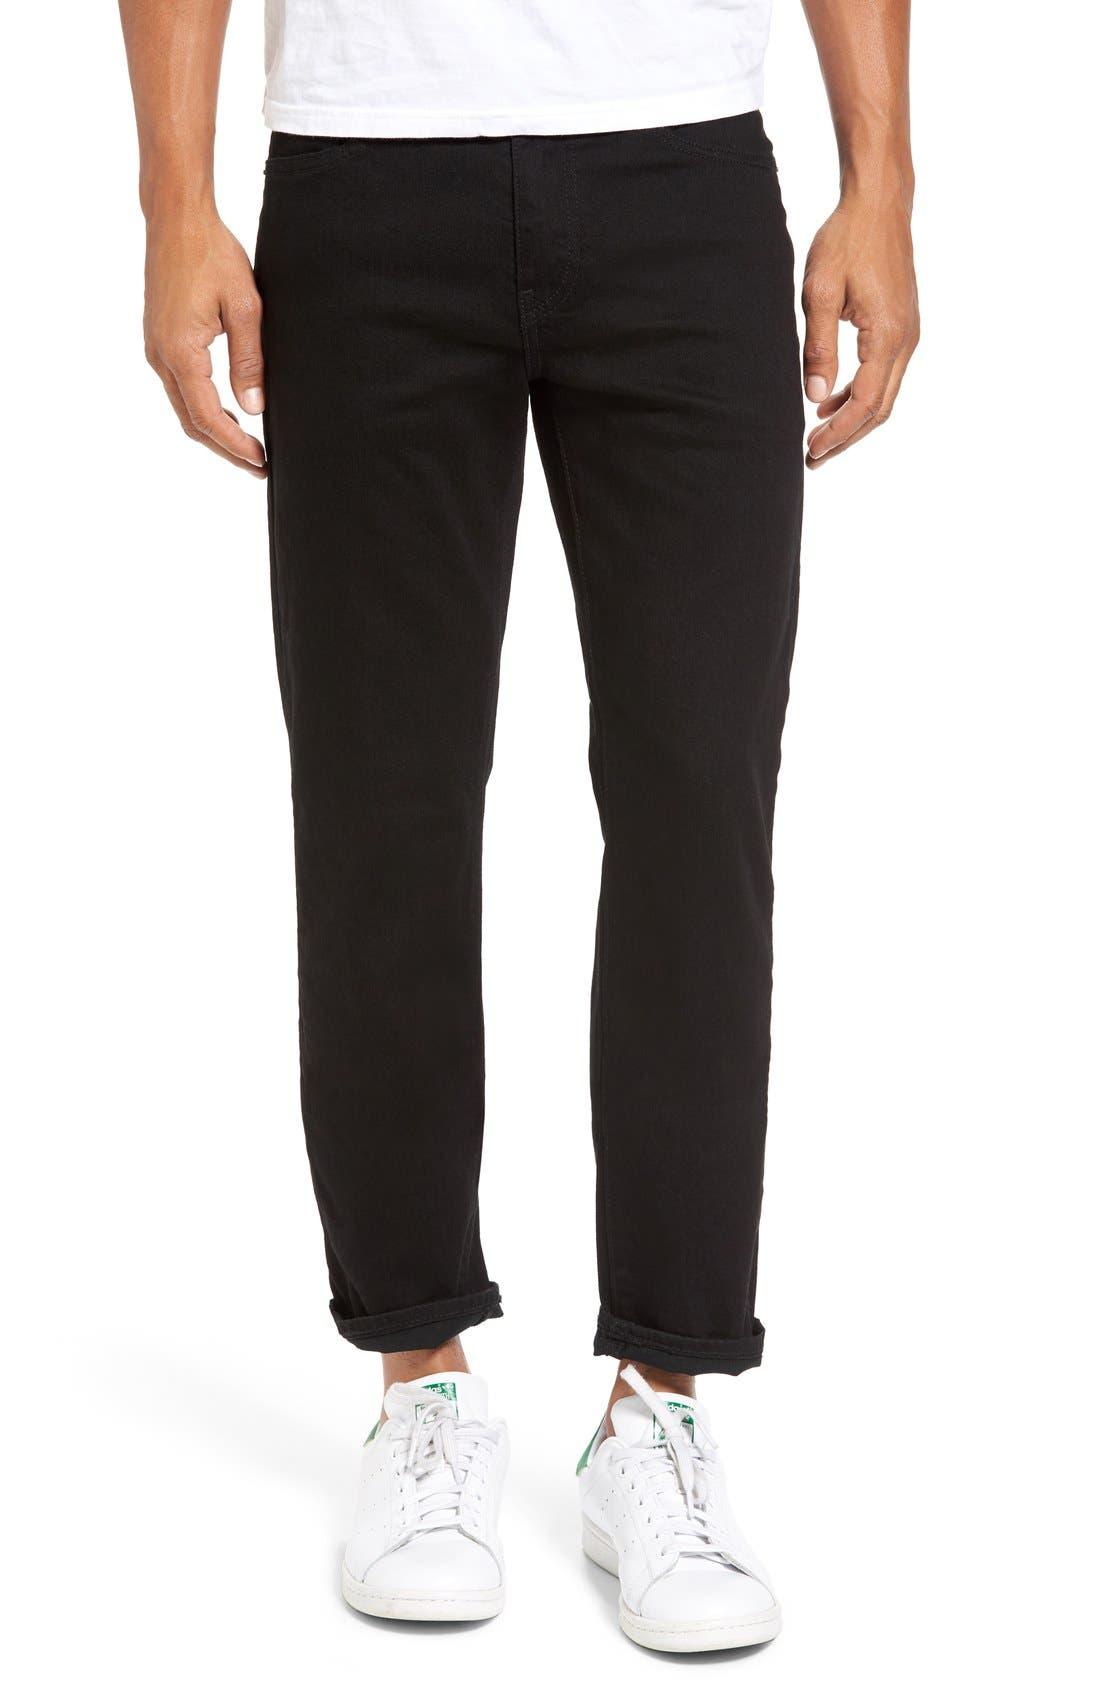 Alternate Image 1 Selected - Levi's® 511™ Slim Fit Jeans (Nightshine) (Regular & Tall)